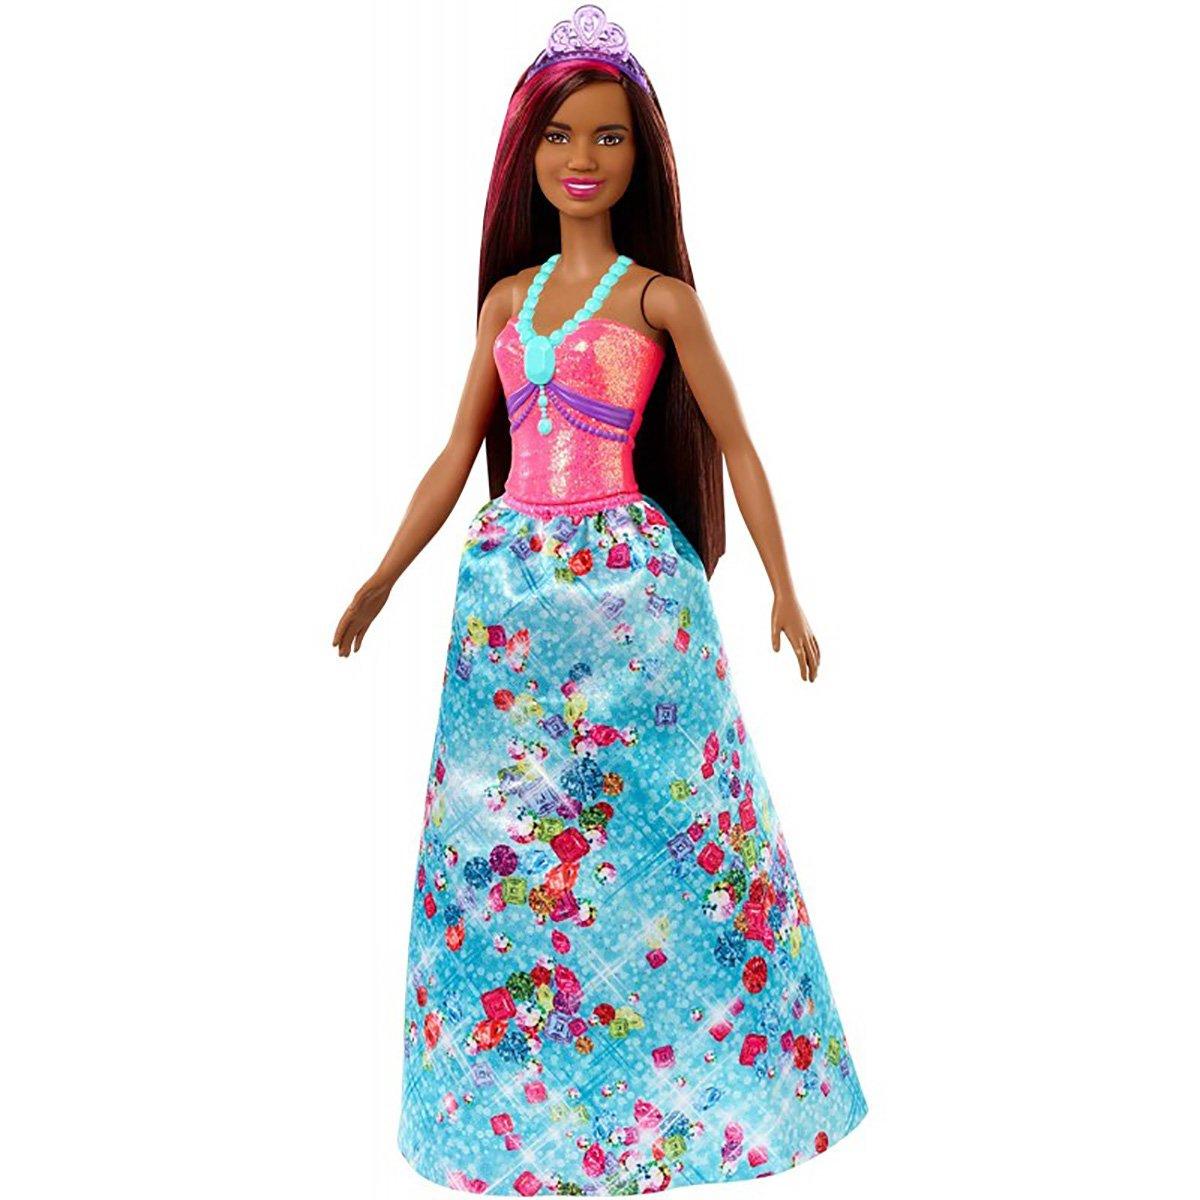 Papusa Barbie Dreamtopia Printesa (GJK15)